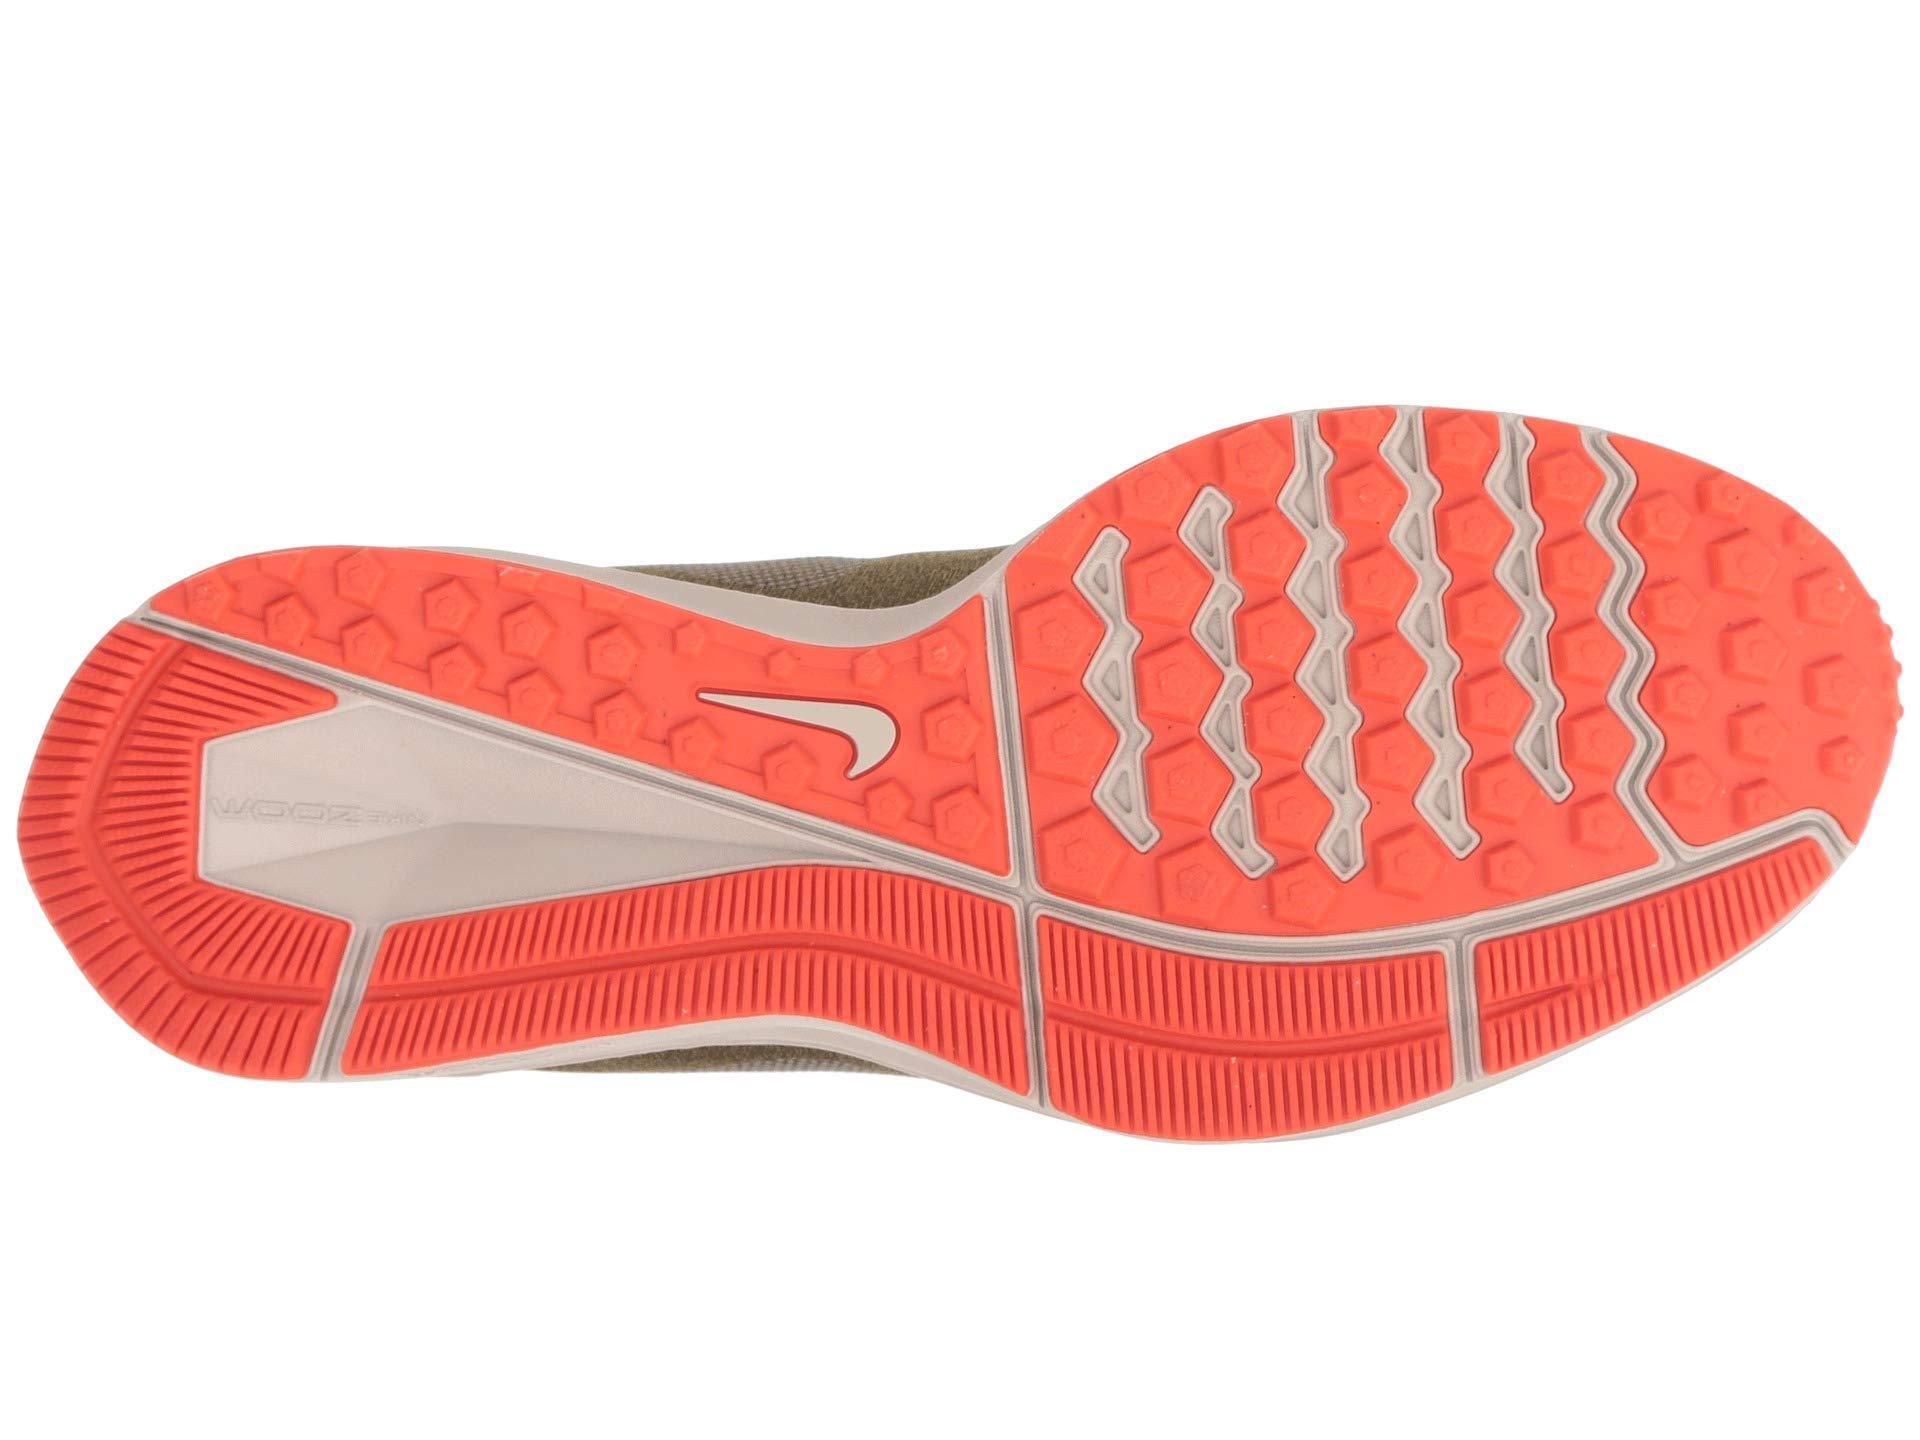 5cc2758ce11f Nike - Air Zoom Winflo 5 Run Shield (olive Flak metallic Silver string.  View fullscreen